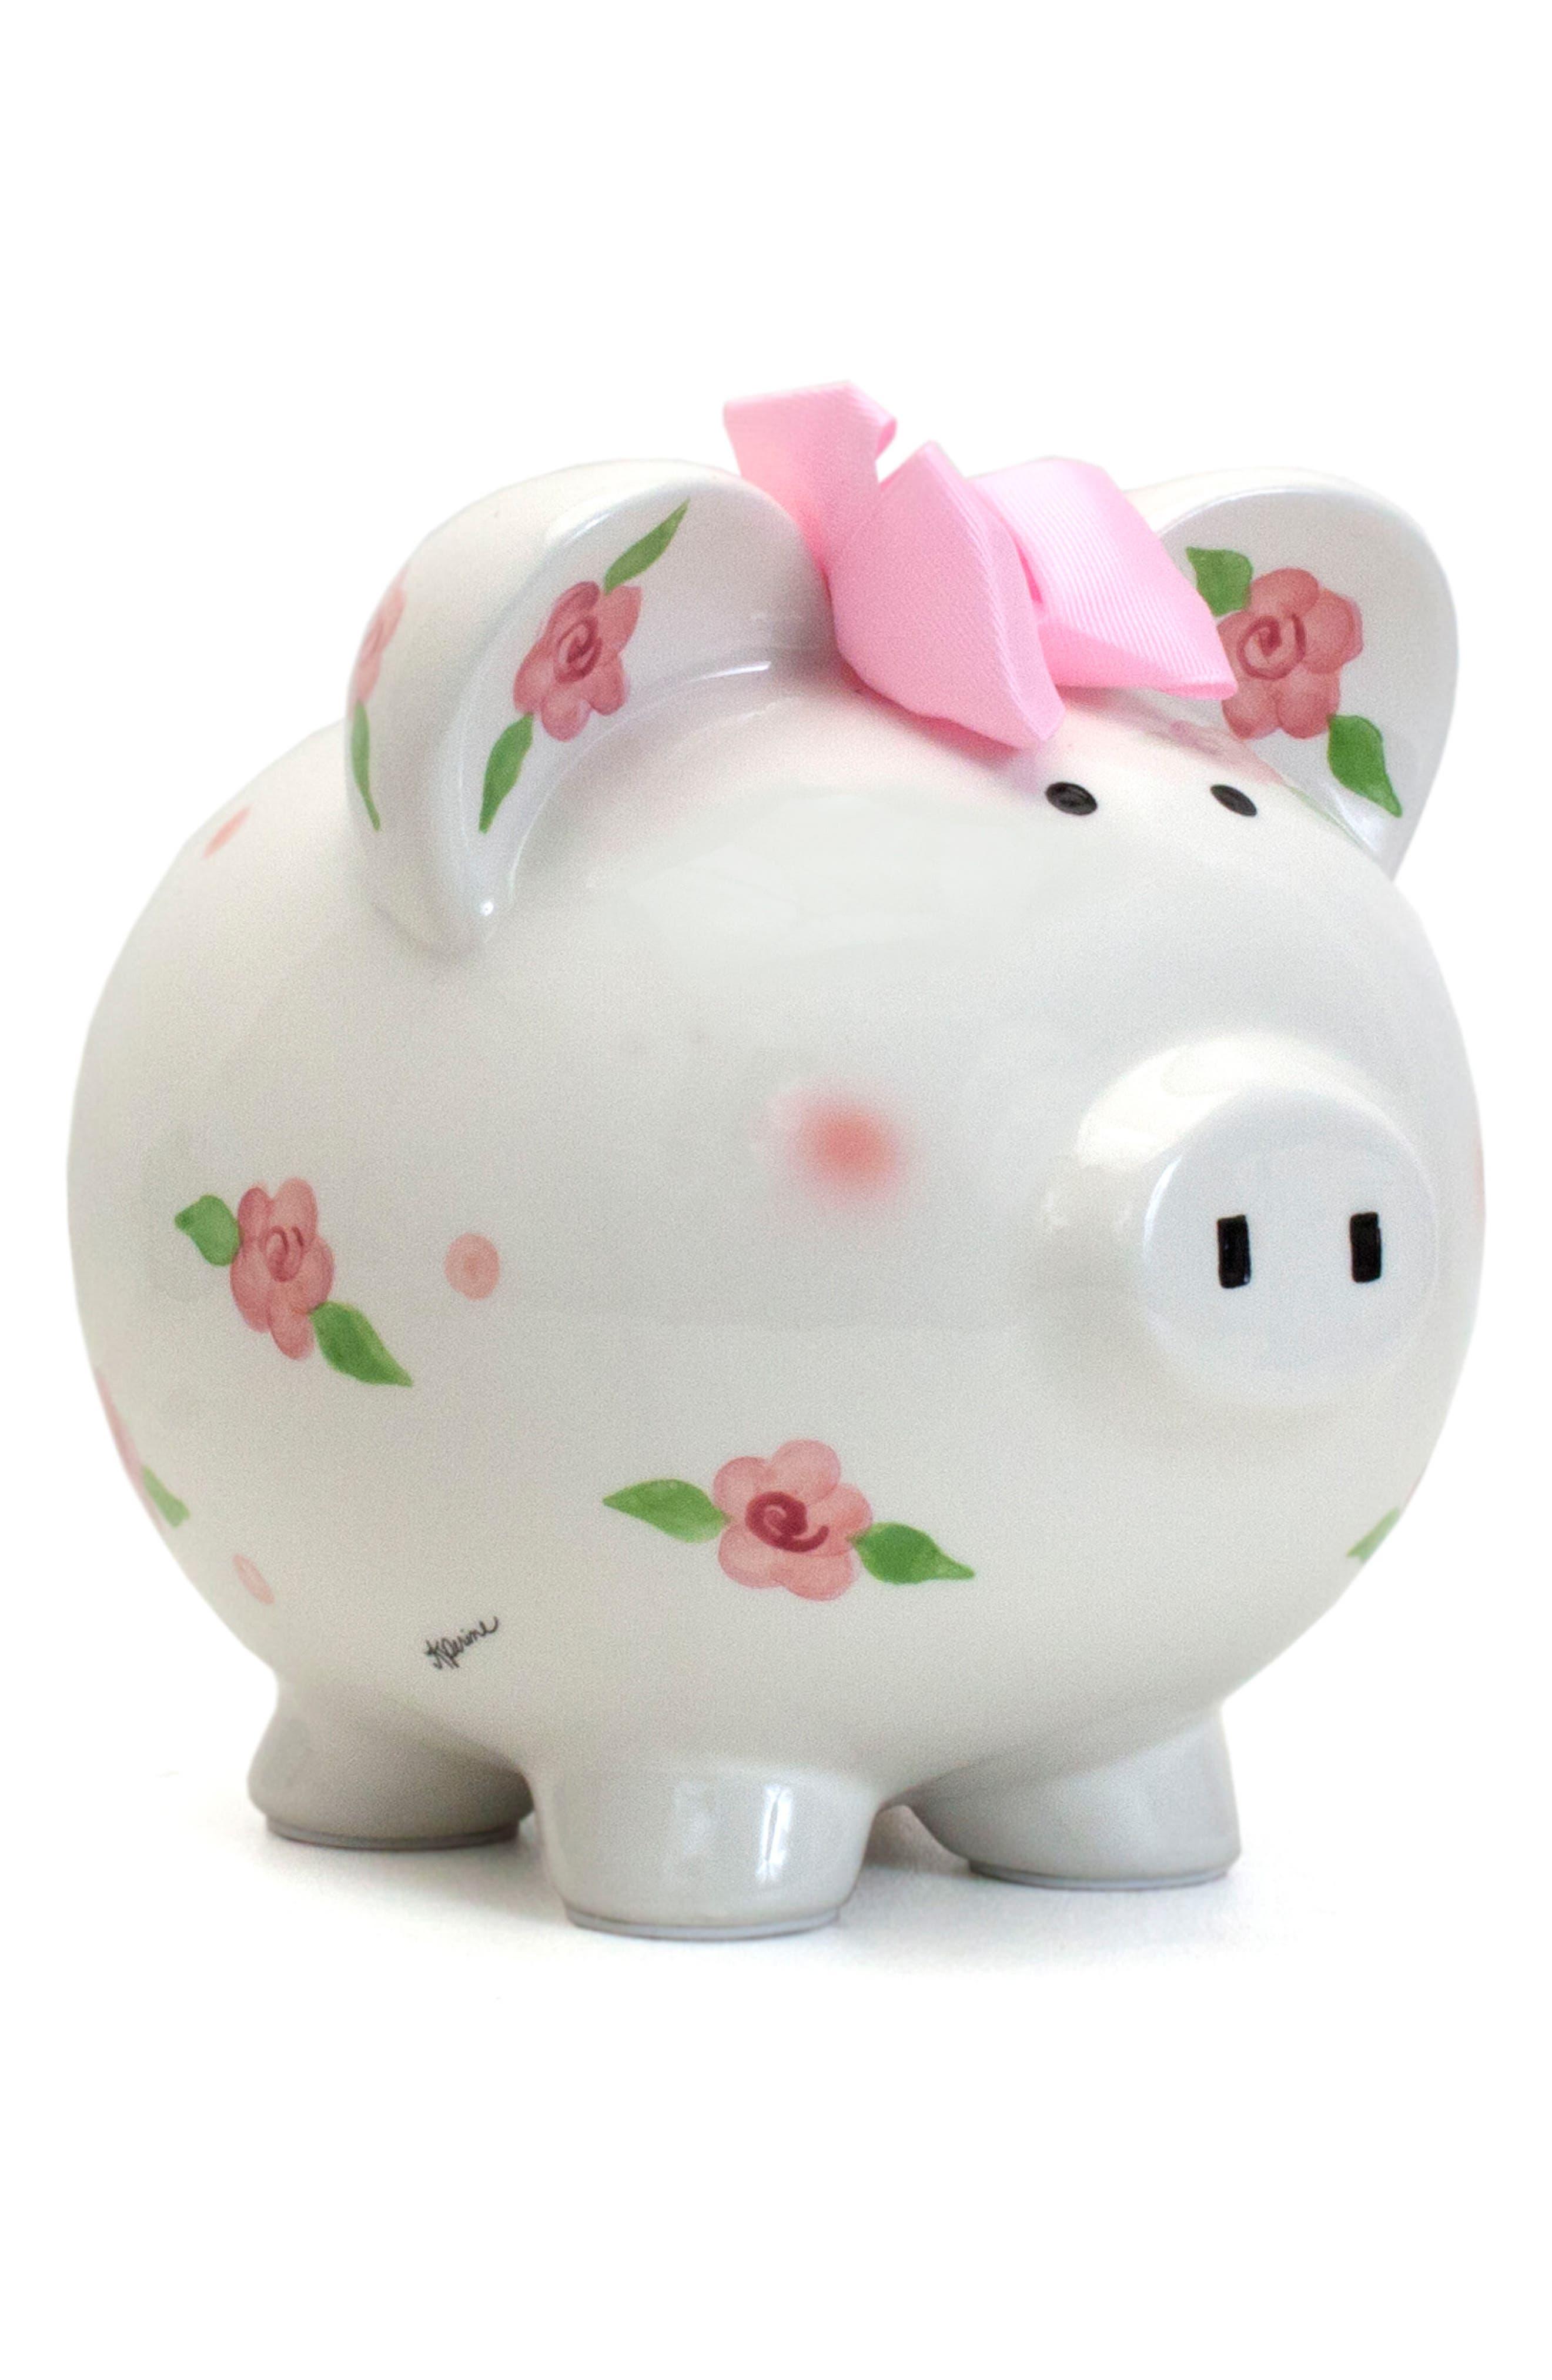 Embellished Piggy Bank,                             Main thumbnail 1, color,                             WHITE